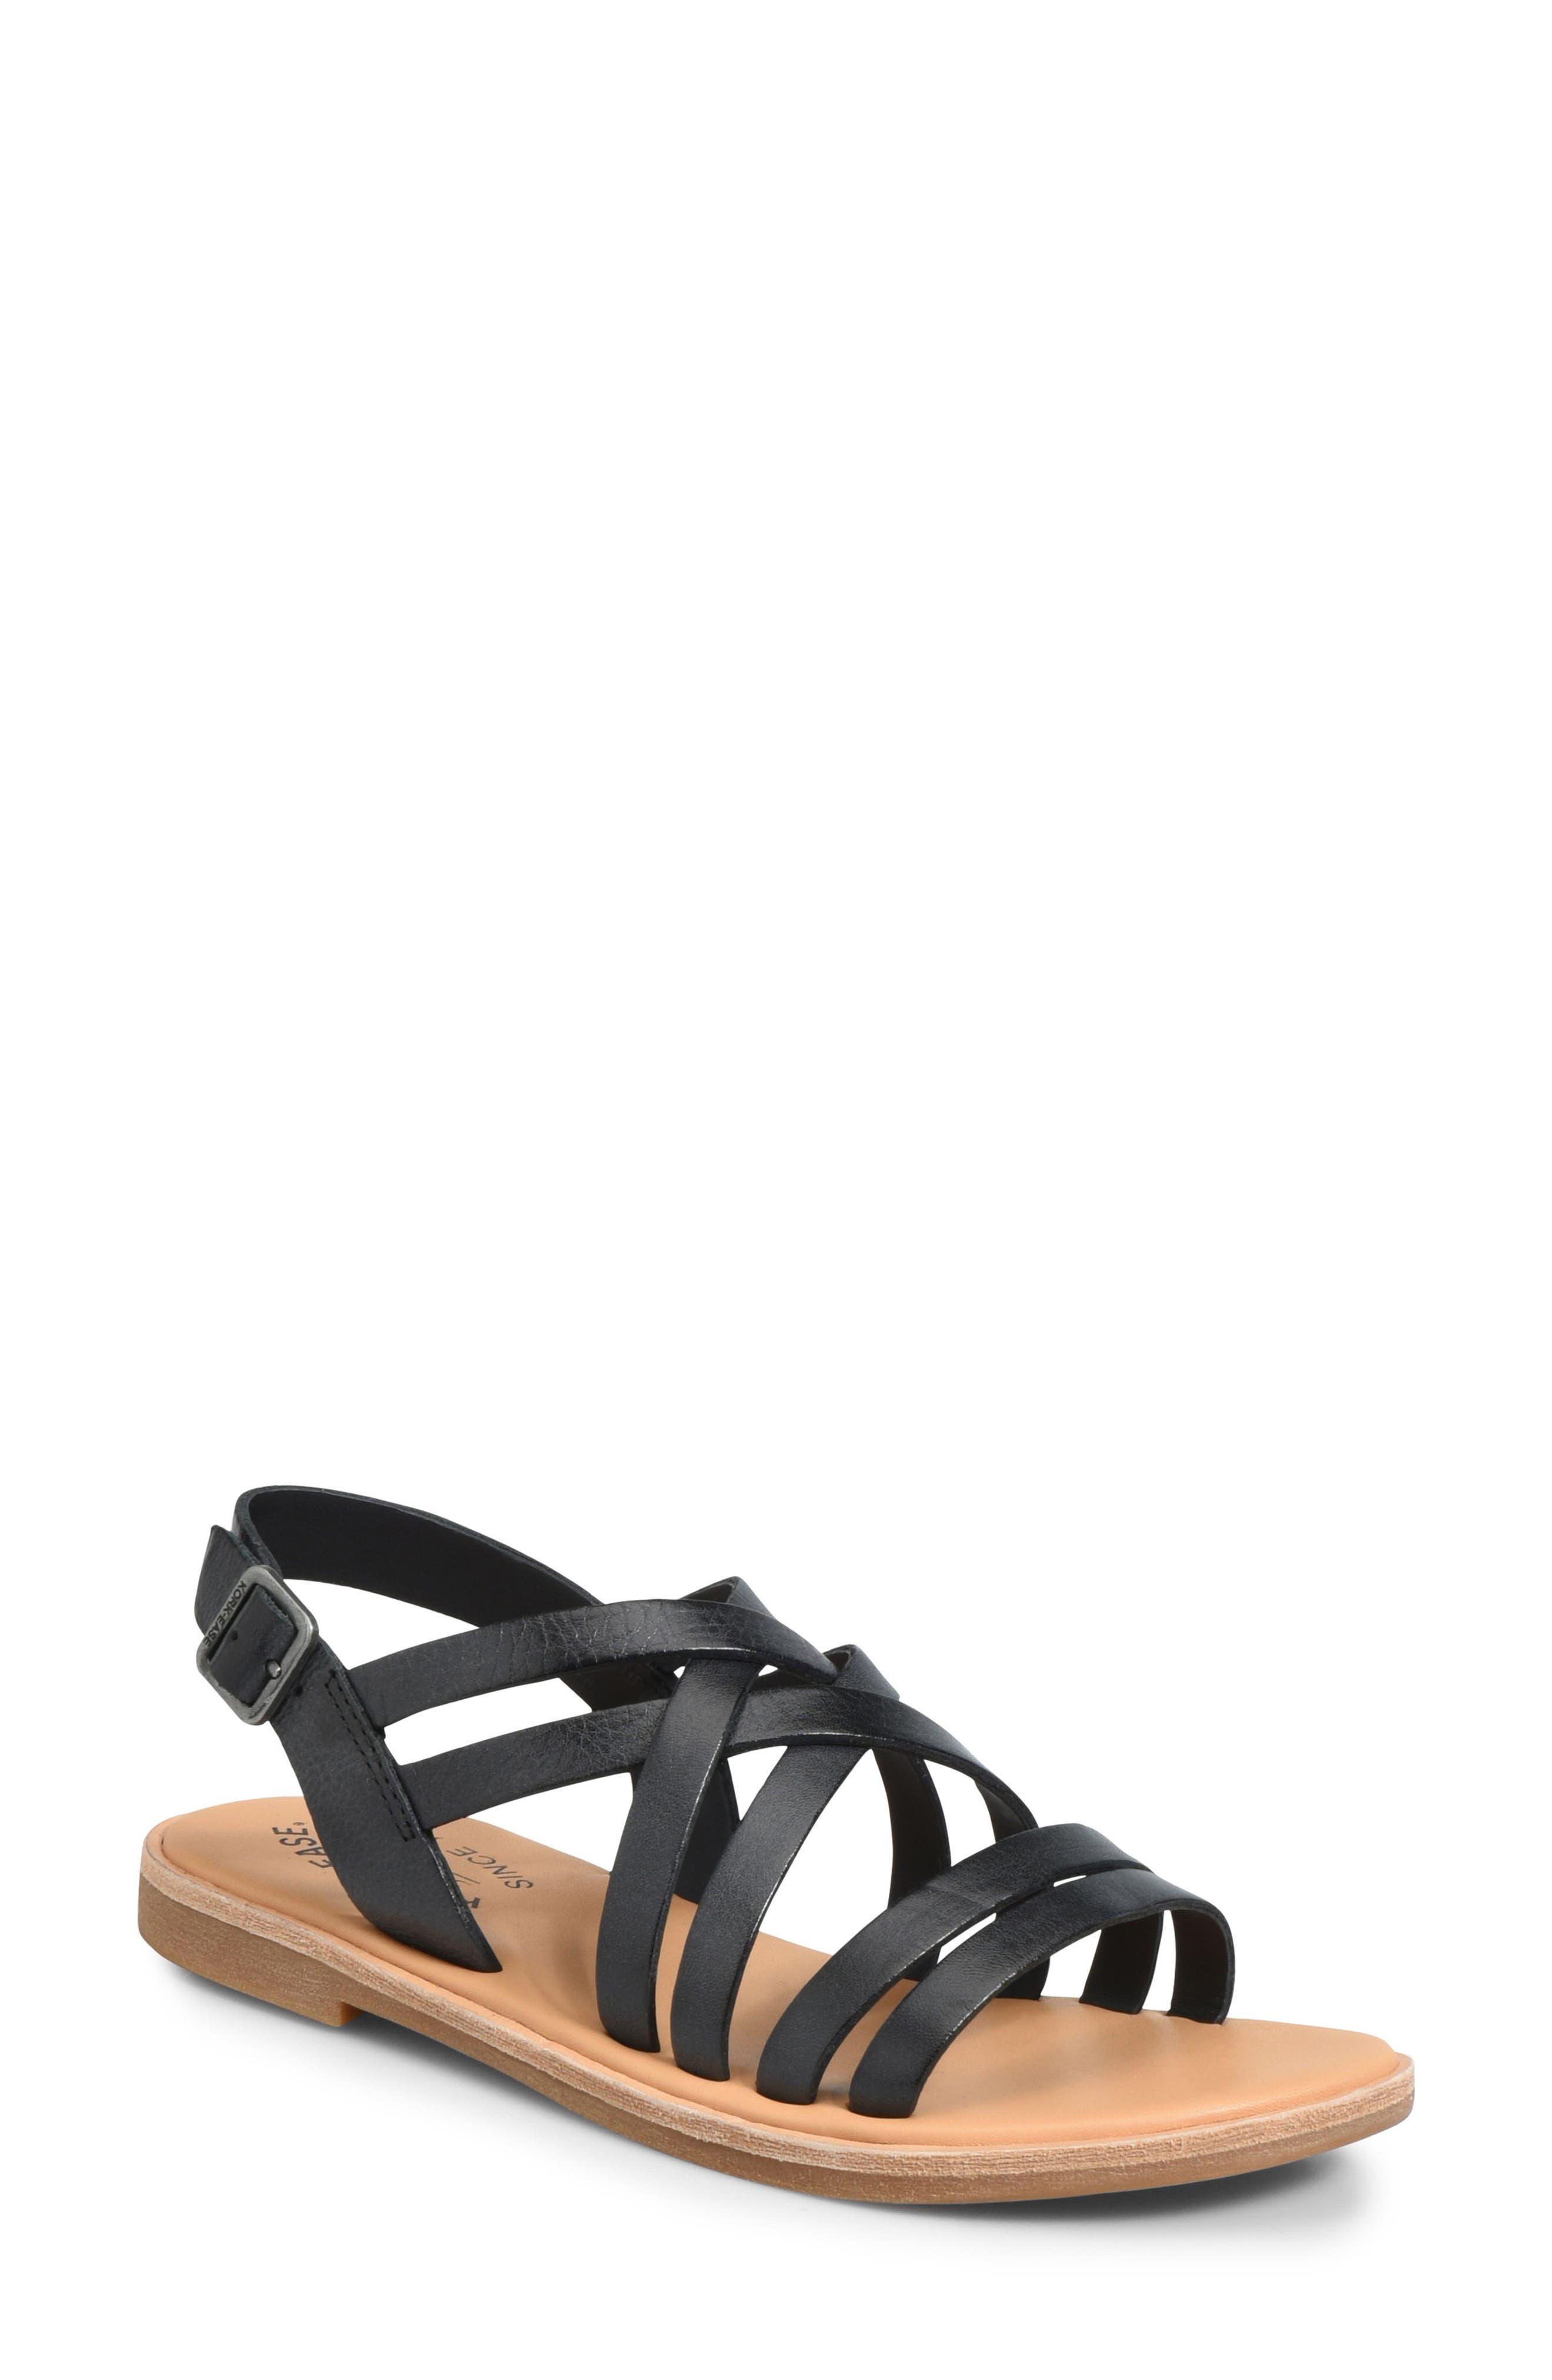 Nicobar Sandal,                         Main,                         color, BLACK LEATHER